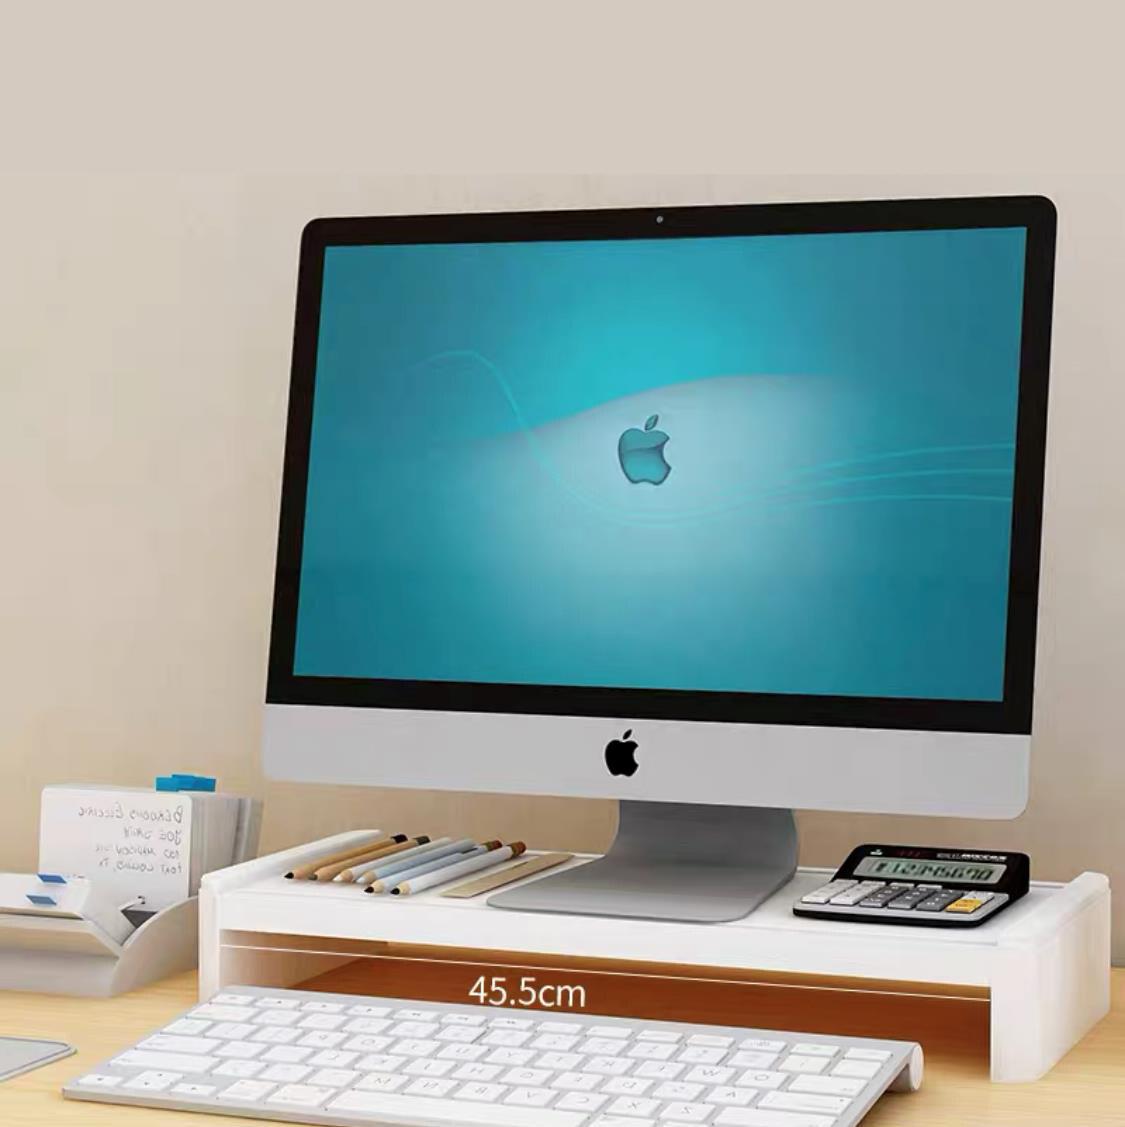 HEINOชั้นวางจอคอมพิวเตอร์ วางโน๊ตบุ๊ค จัดชุดพร้อมลิ้นชัก มี4สี โต๊ะตั้งคอม ชั้นวางของสำหรับทำงาน ชั้นวางหนังสือ โต๊เขียนหนังสือ ใช้งานได้หลายรูปแบบ